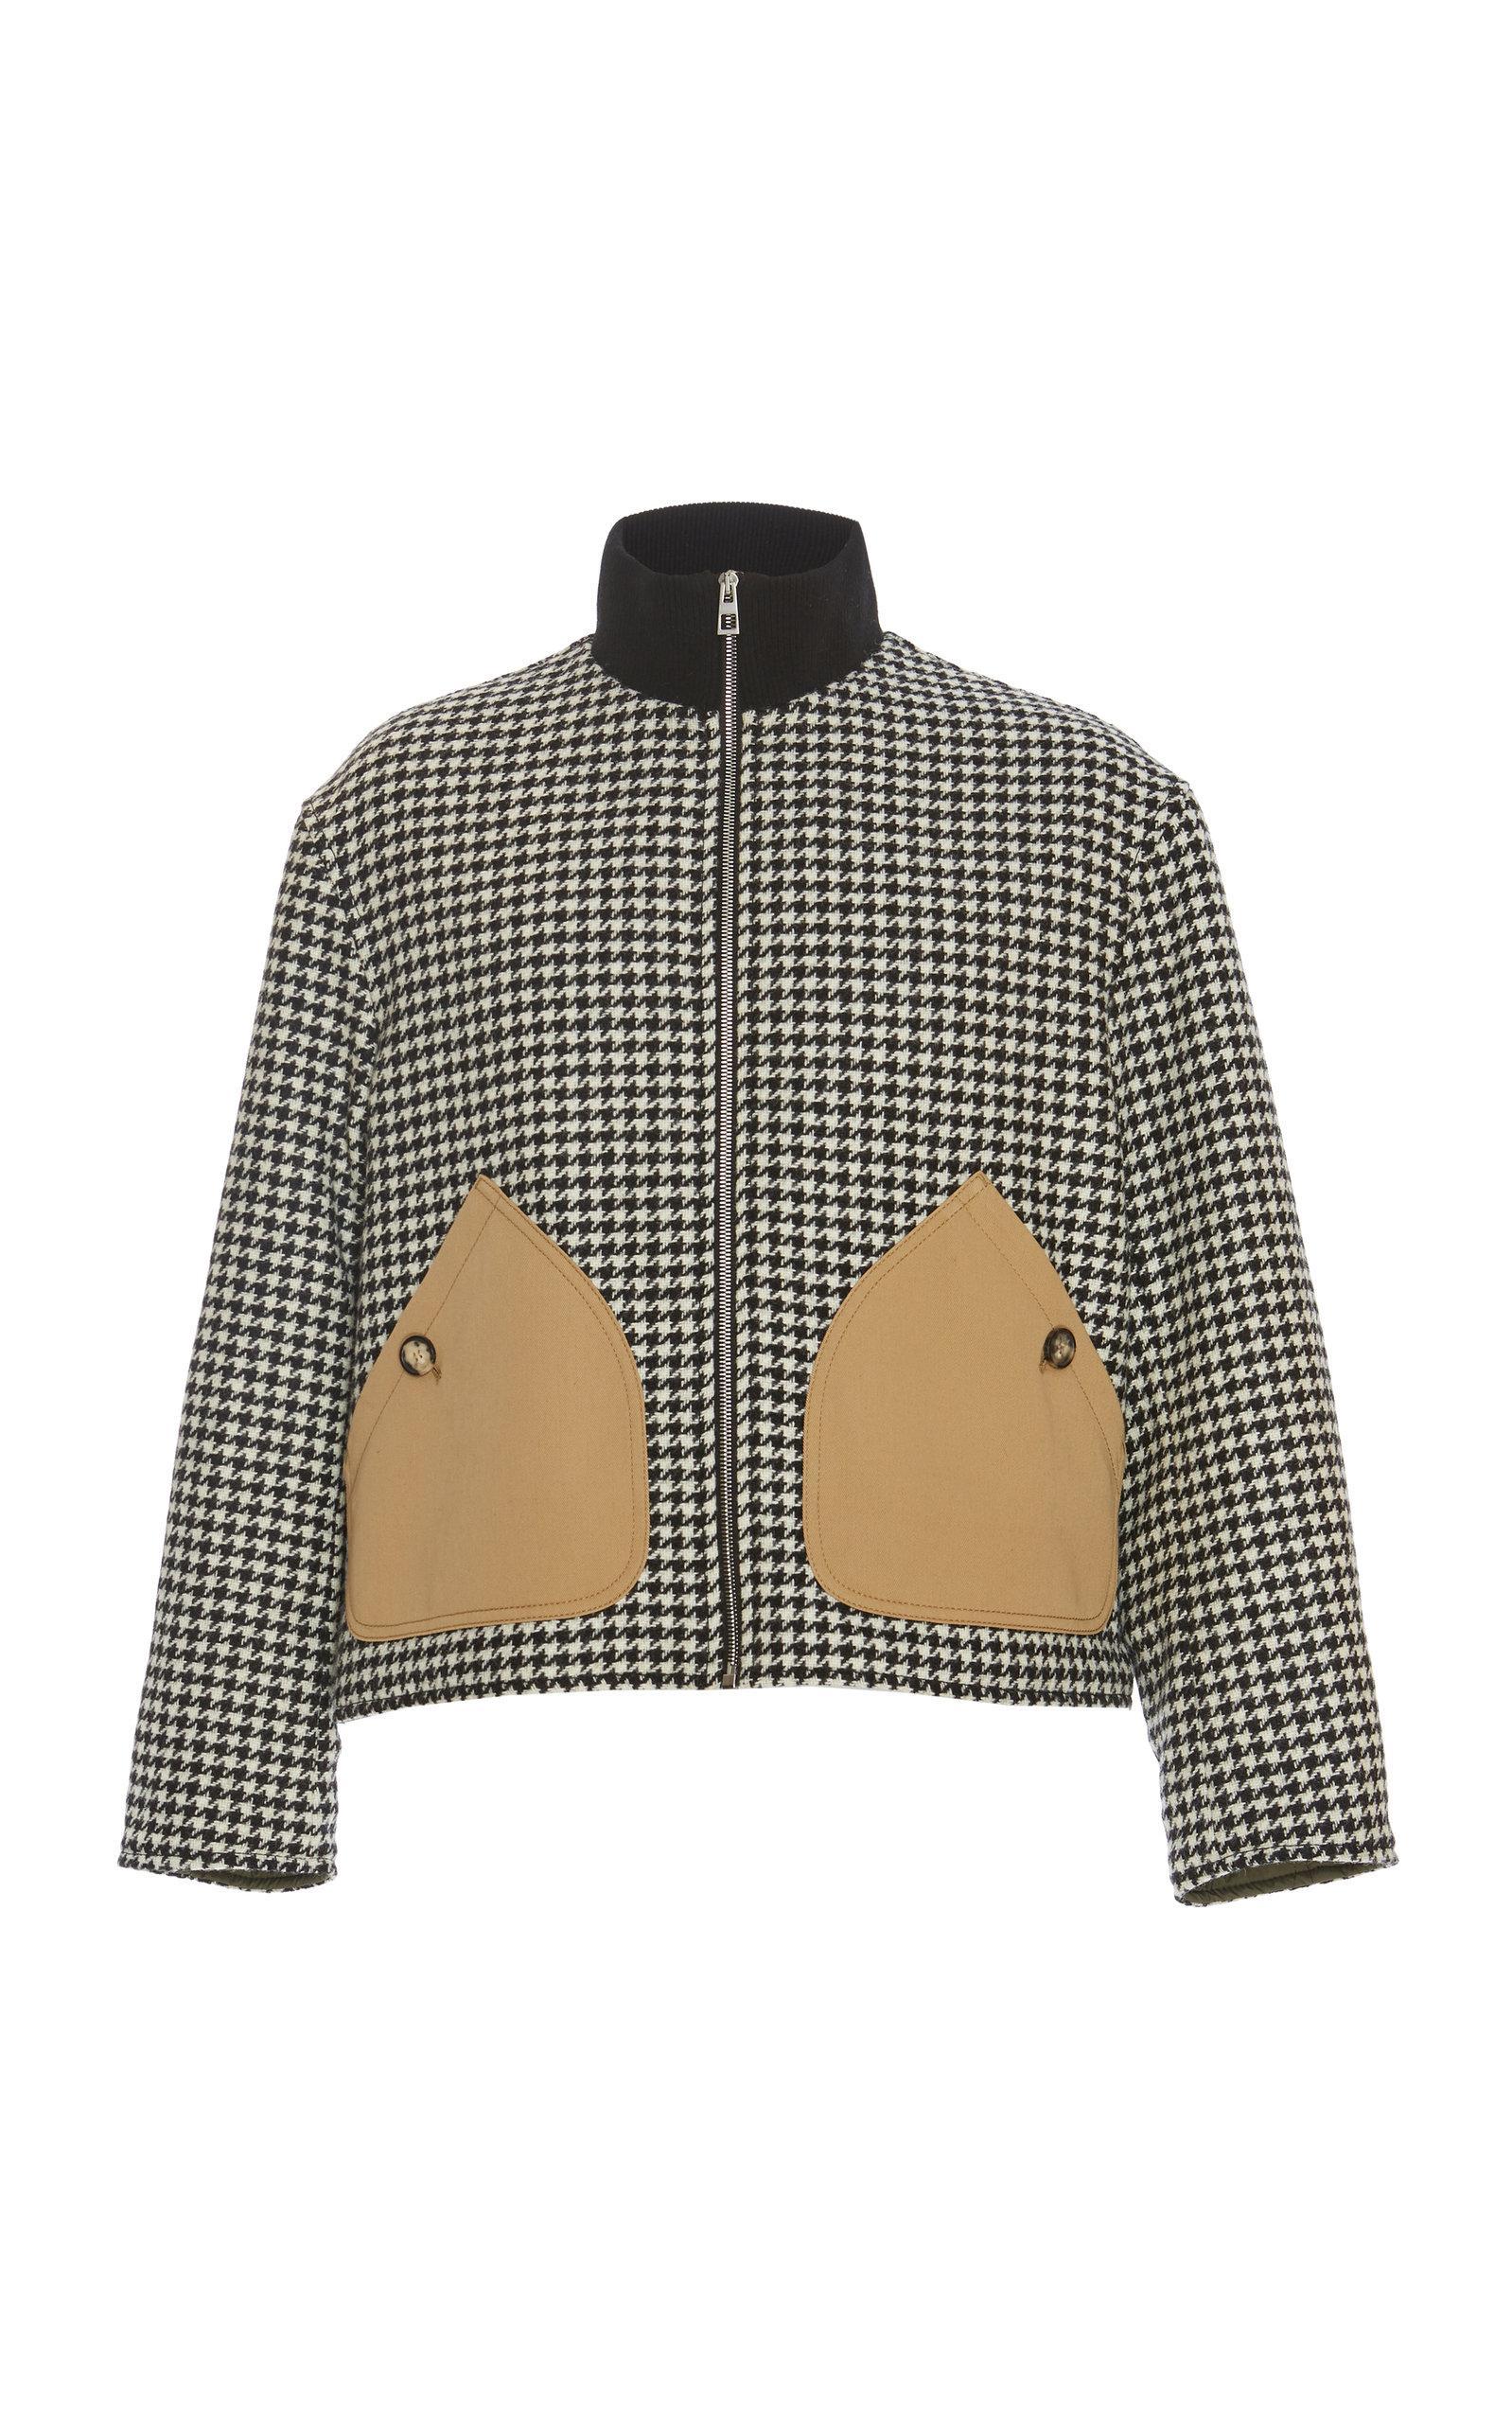 Loewe Houndstooth Zip Jacket Patch Pockets in Black for Men